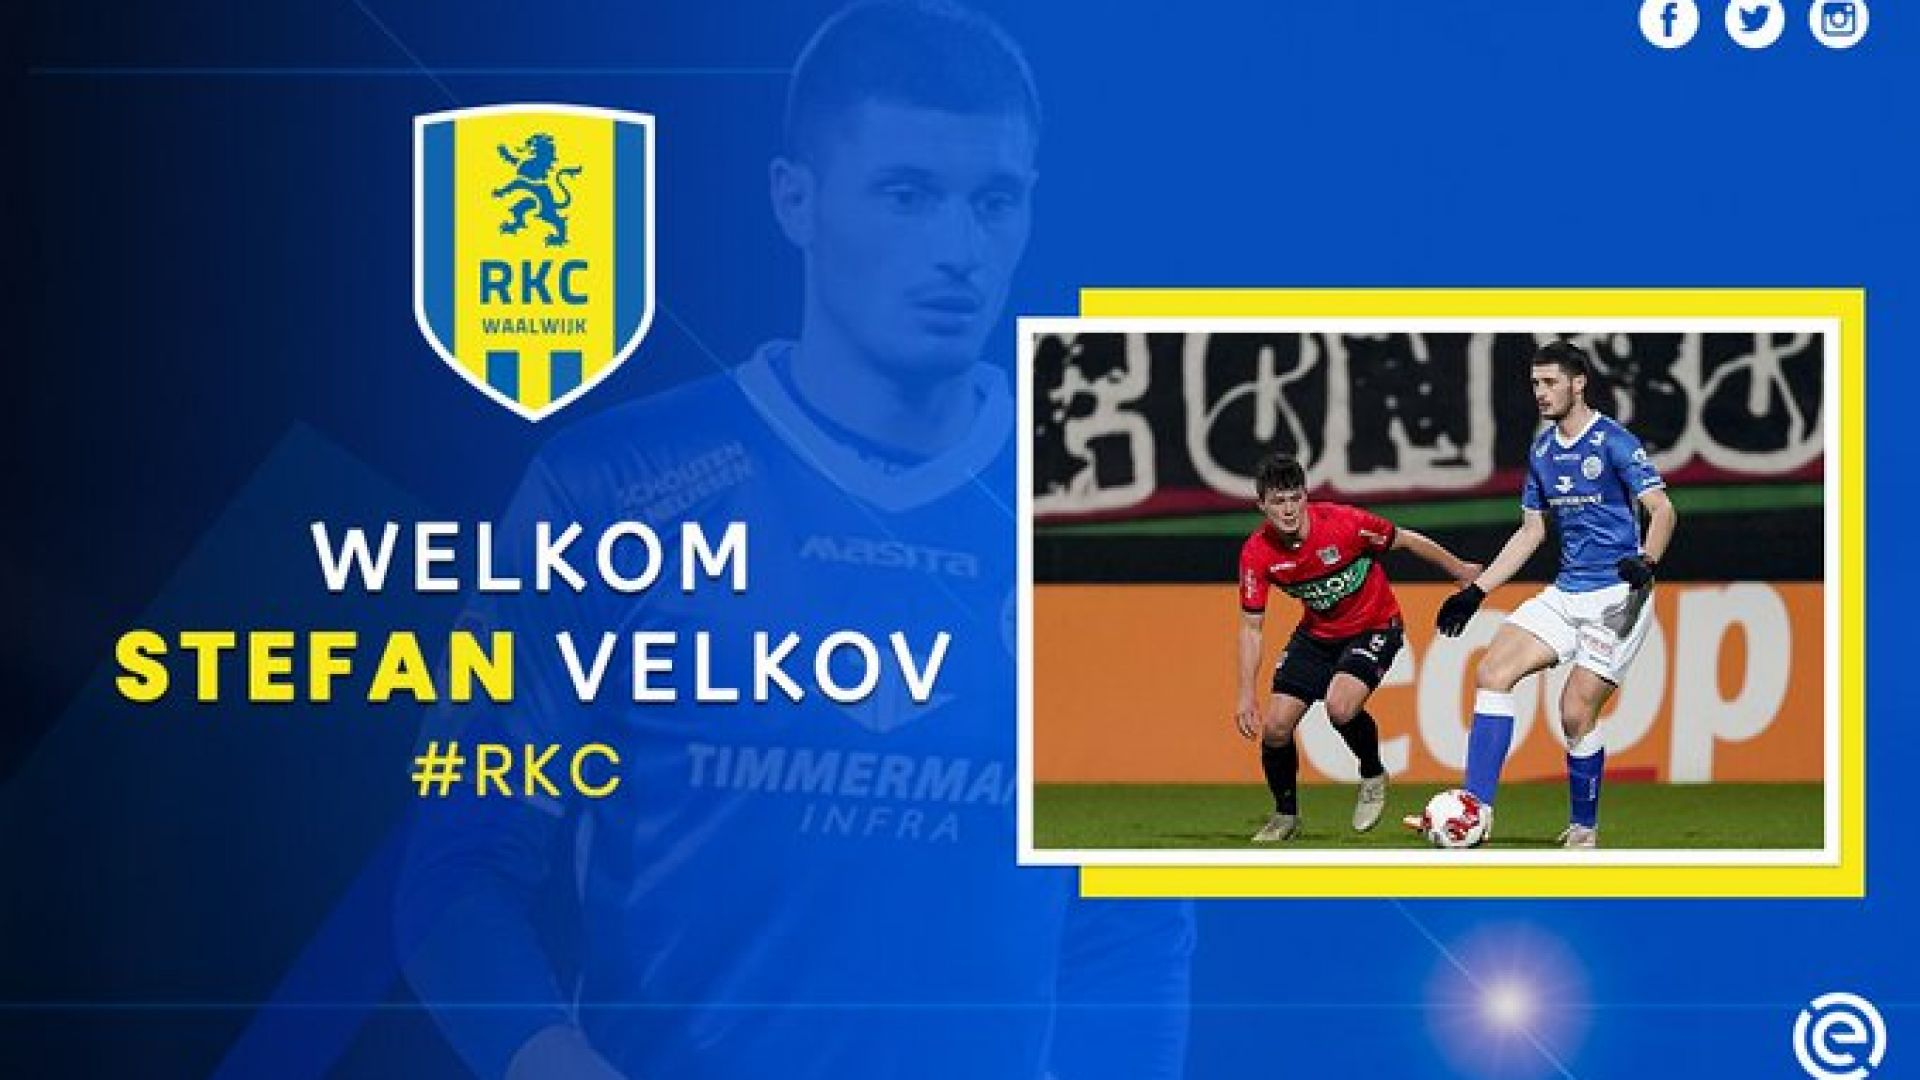 Стефан Велков с нови 90 минути в елита на Нидерландия